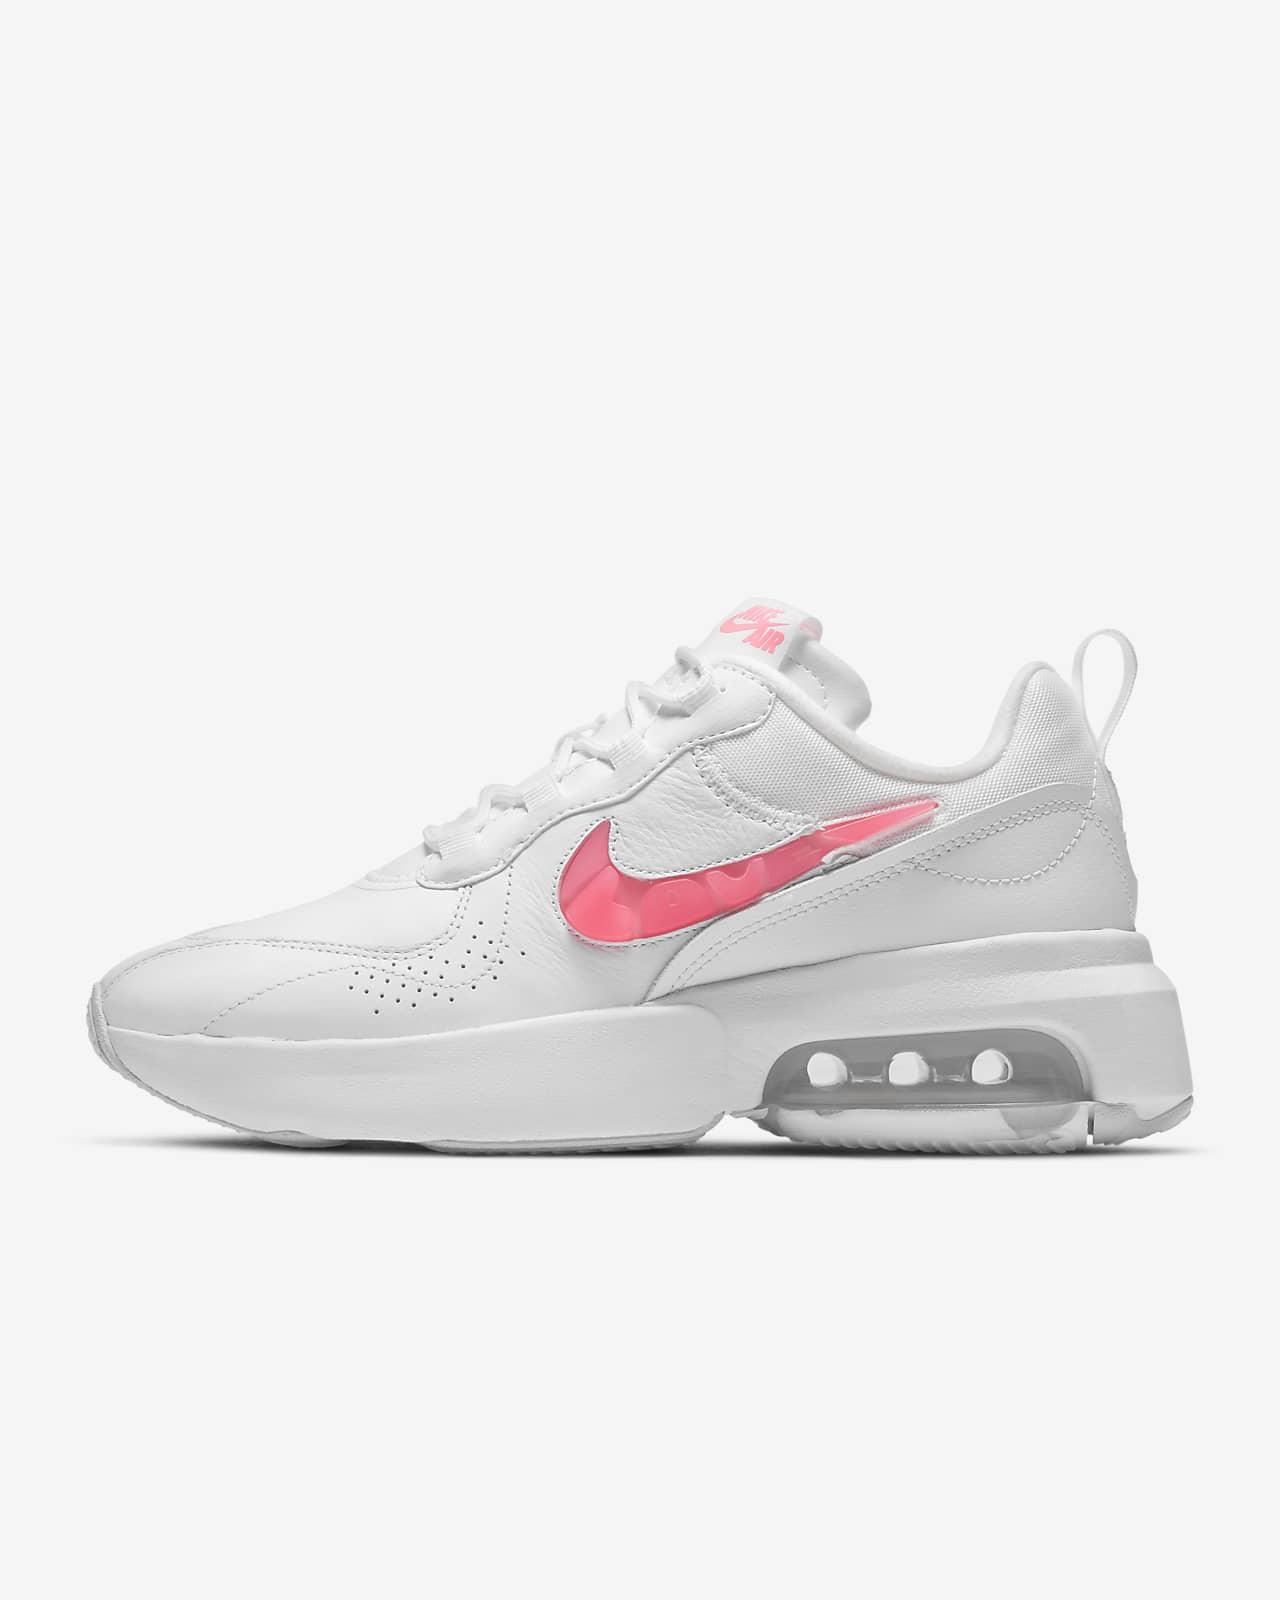 Nike Air Max Verona VDAY 女子运动鞋